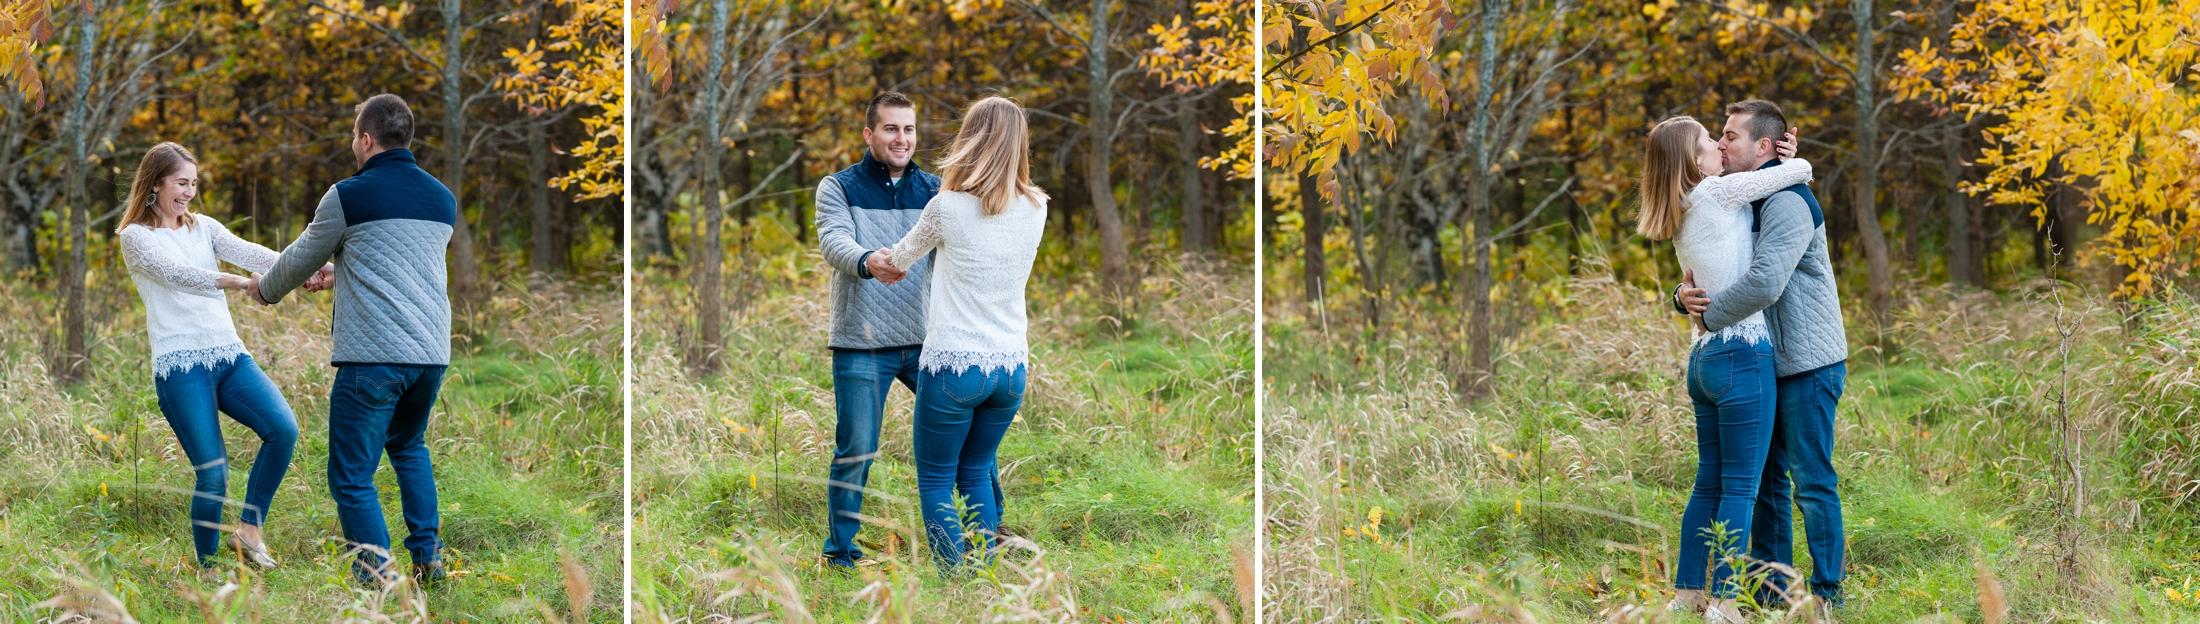 best-wisconsin-wedding-photographer-engagement-session-6.jpg